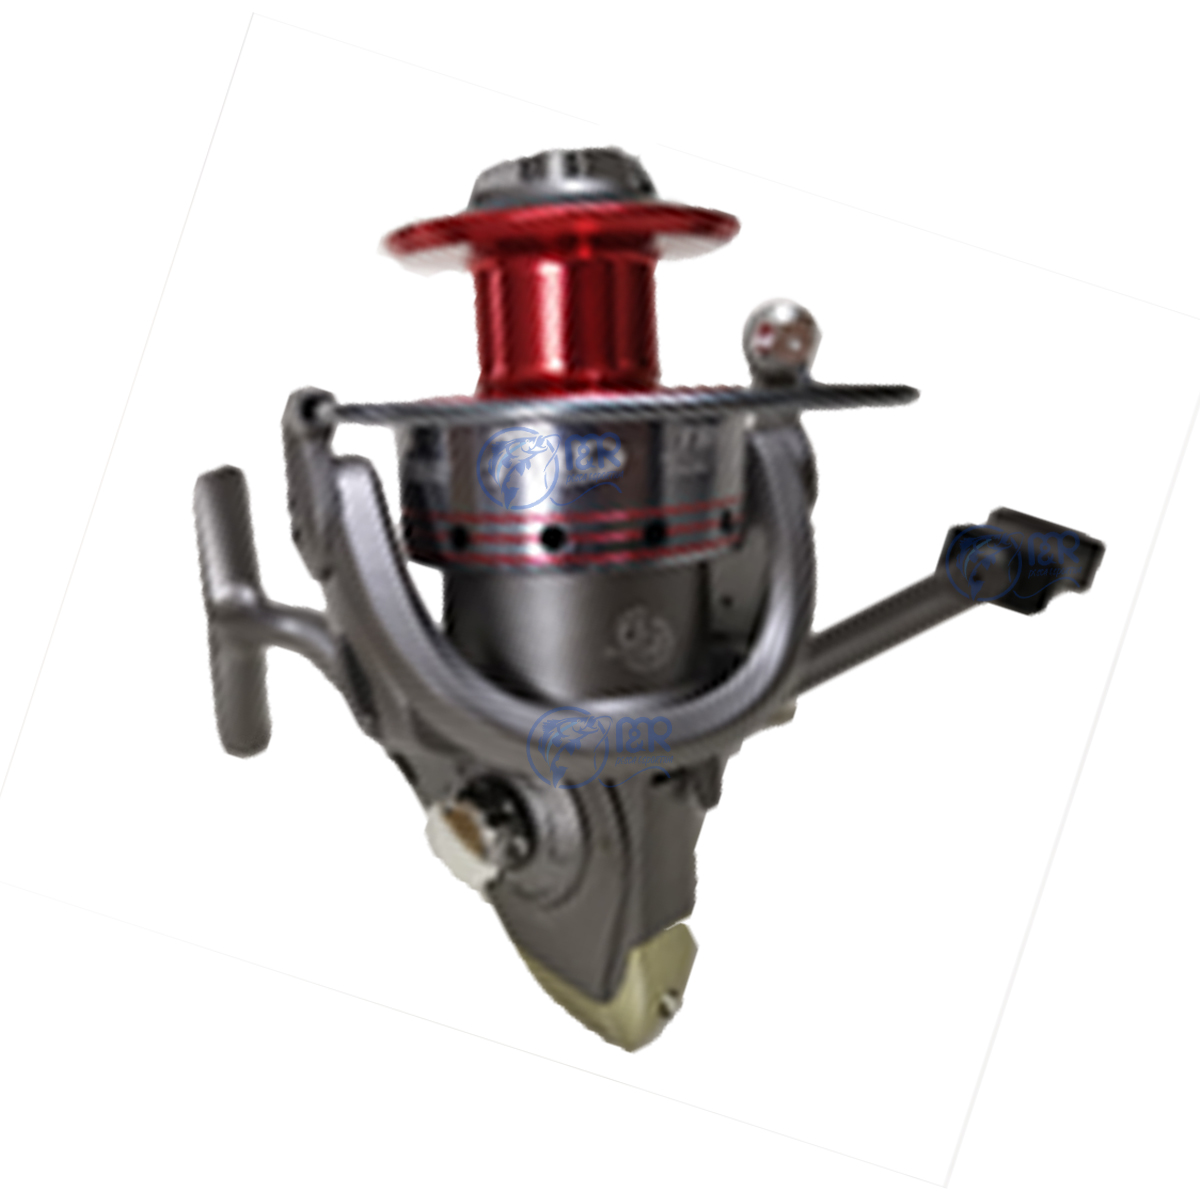 Molinete 3000 TB 6 Rolamentos Carretel Alumínio Drag 3,5kg